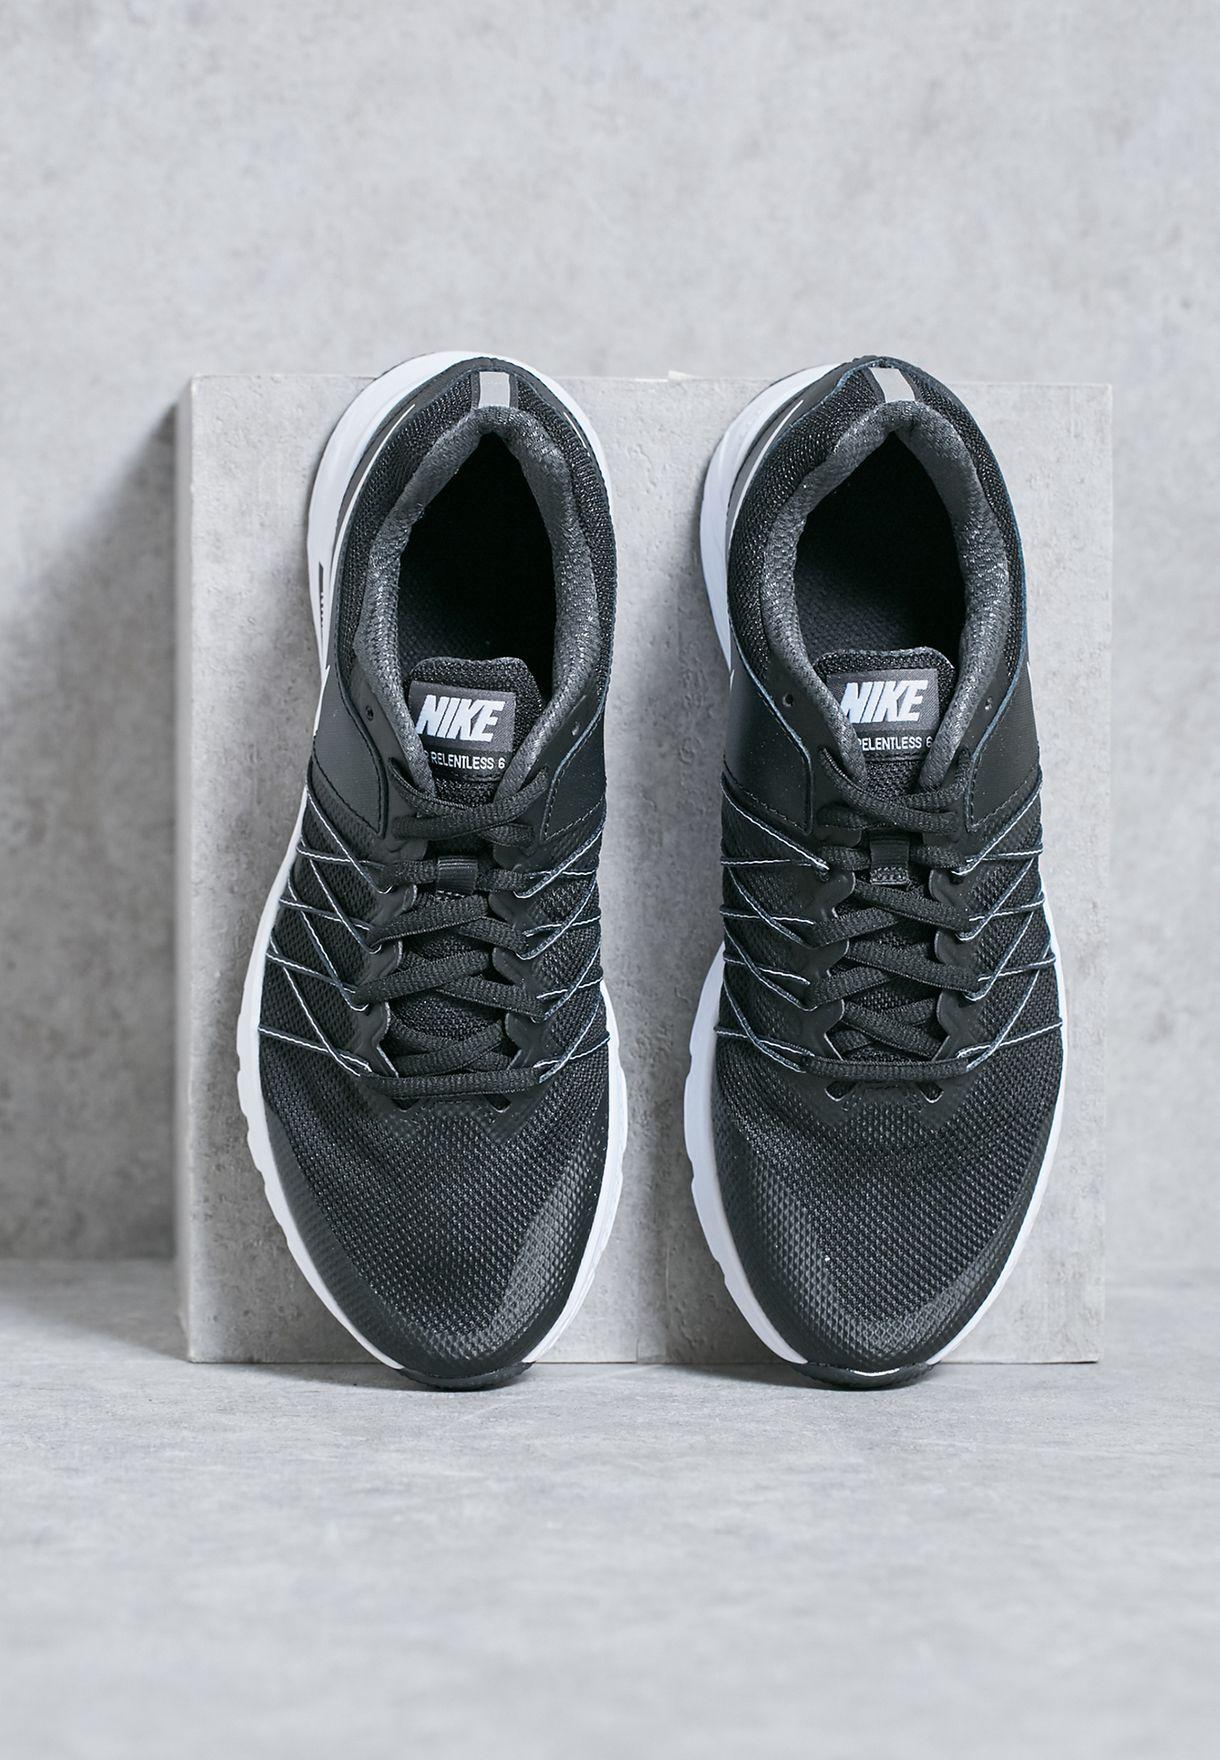 8e75691d76c Shop Nike black Air Relentless 6 843882-001 for Women in UAE ...